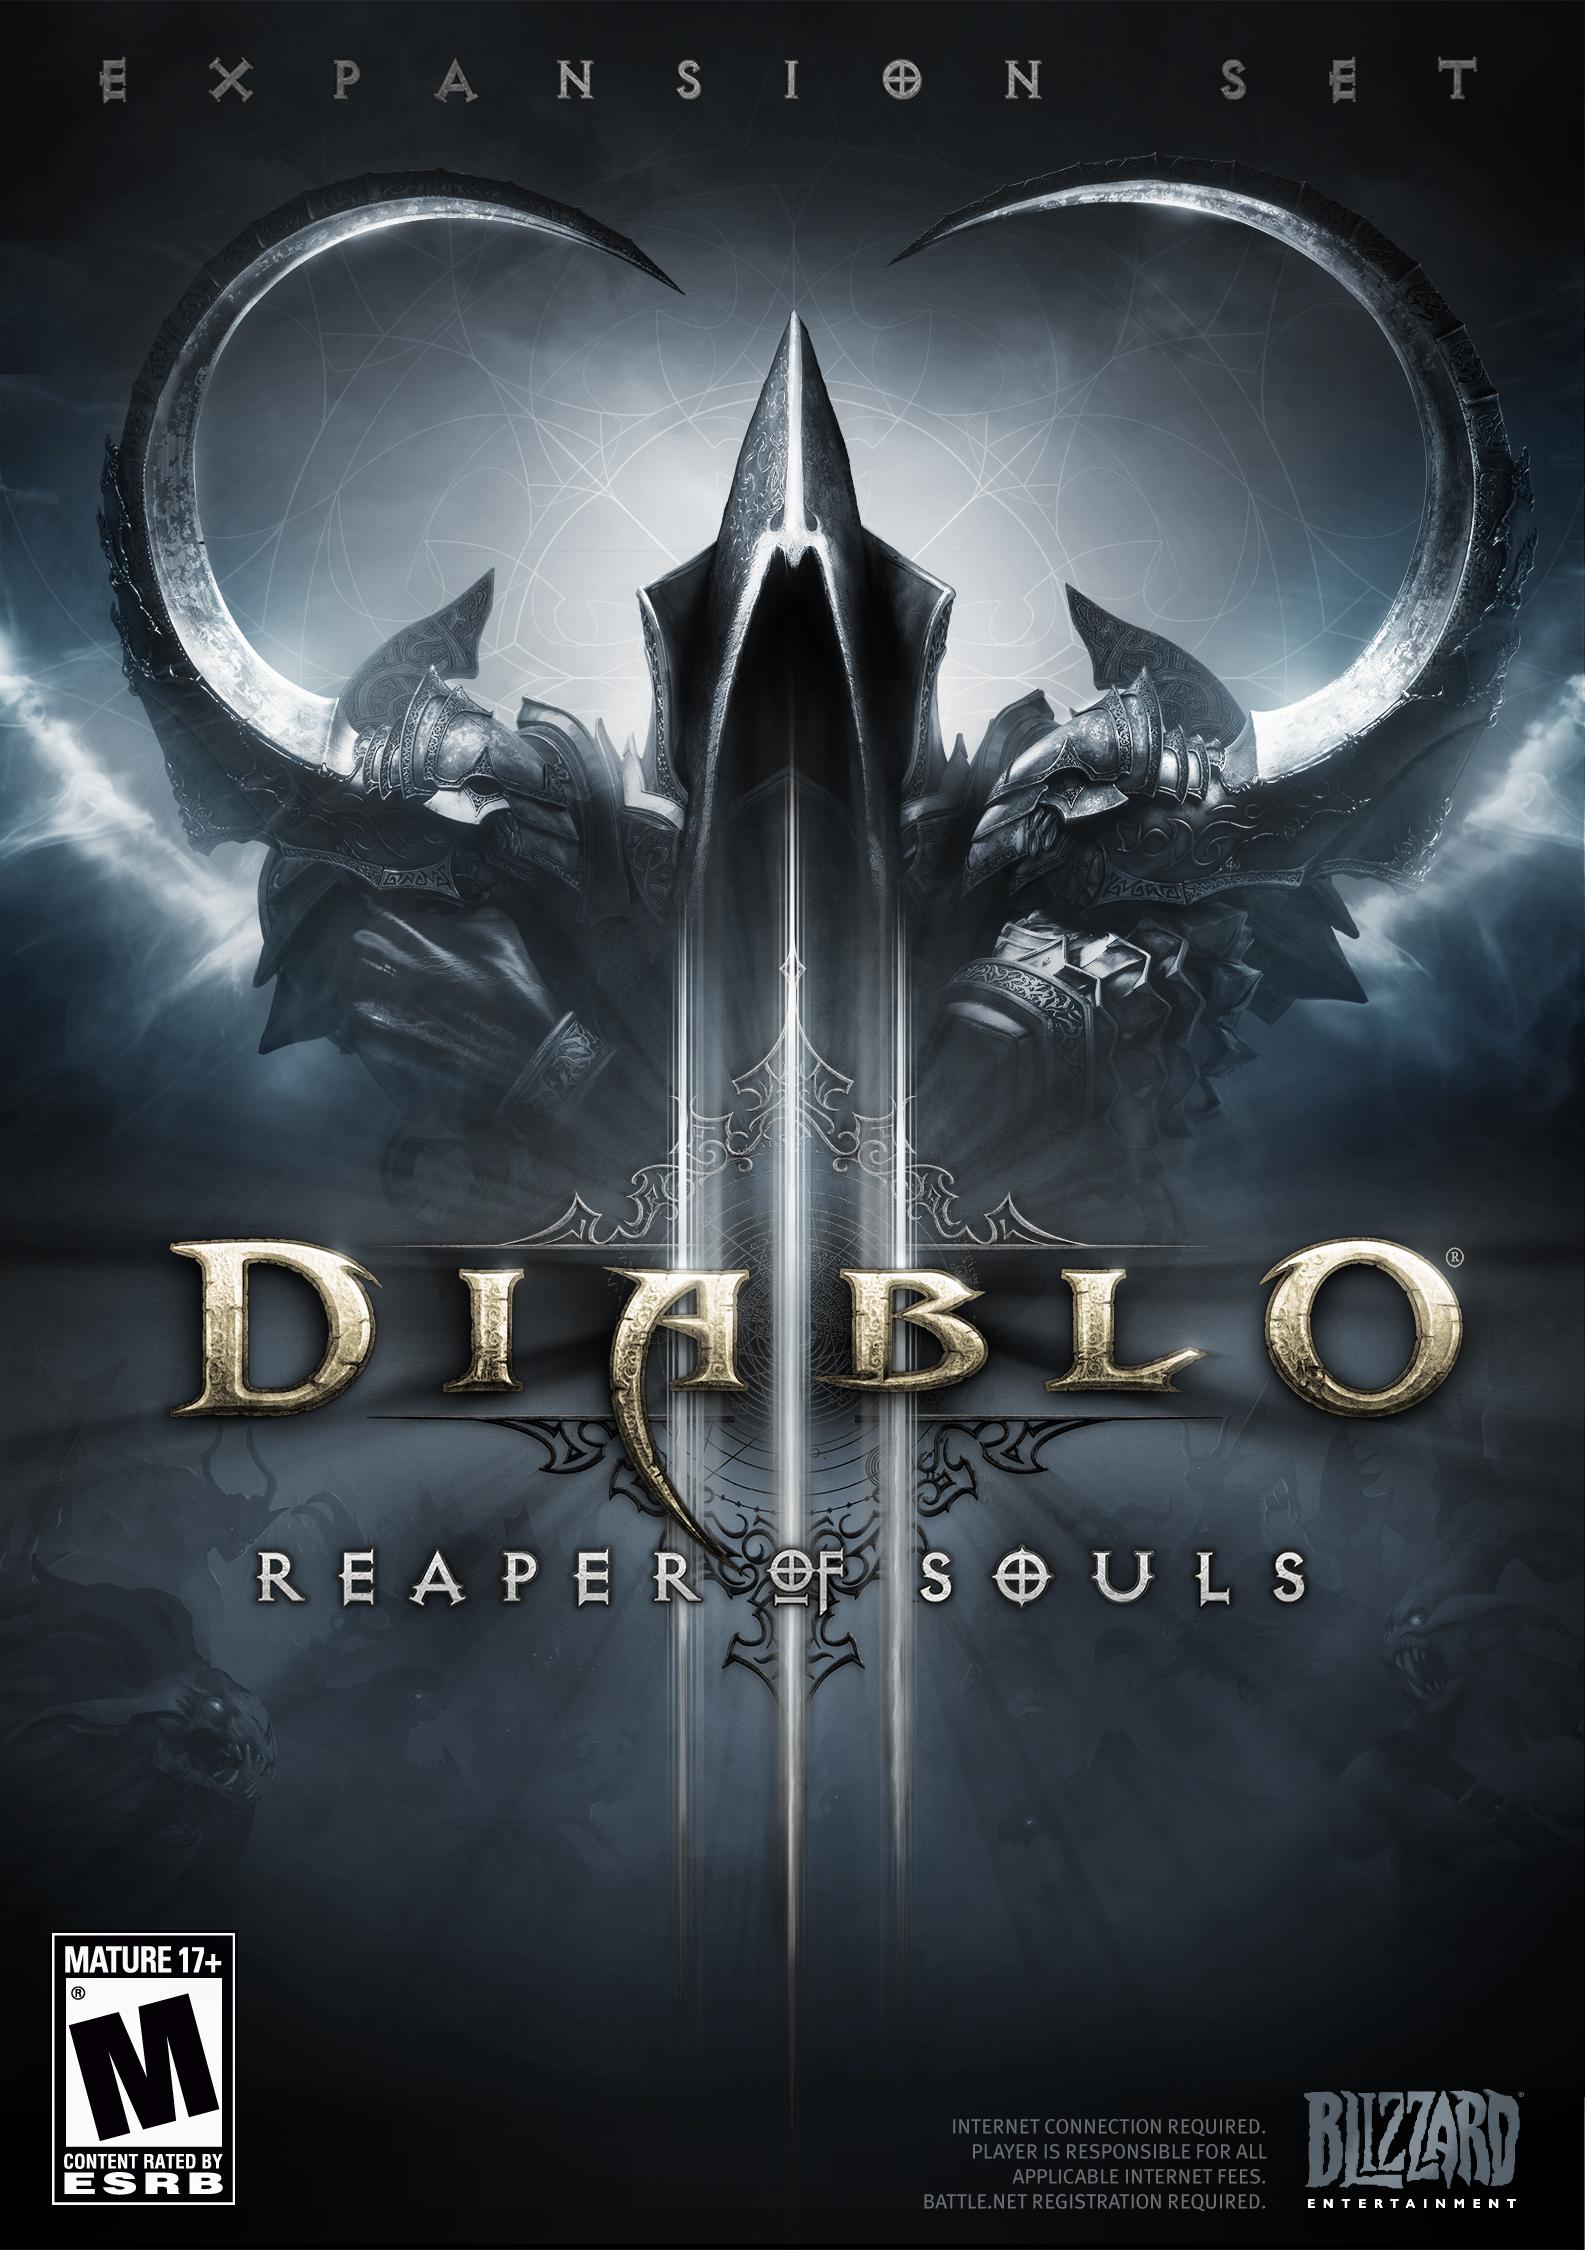 Diablo III: Reaper of Souls (Graphic: Business Wire)